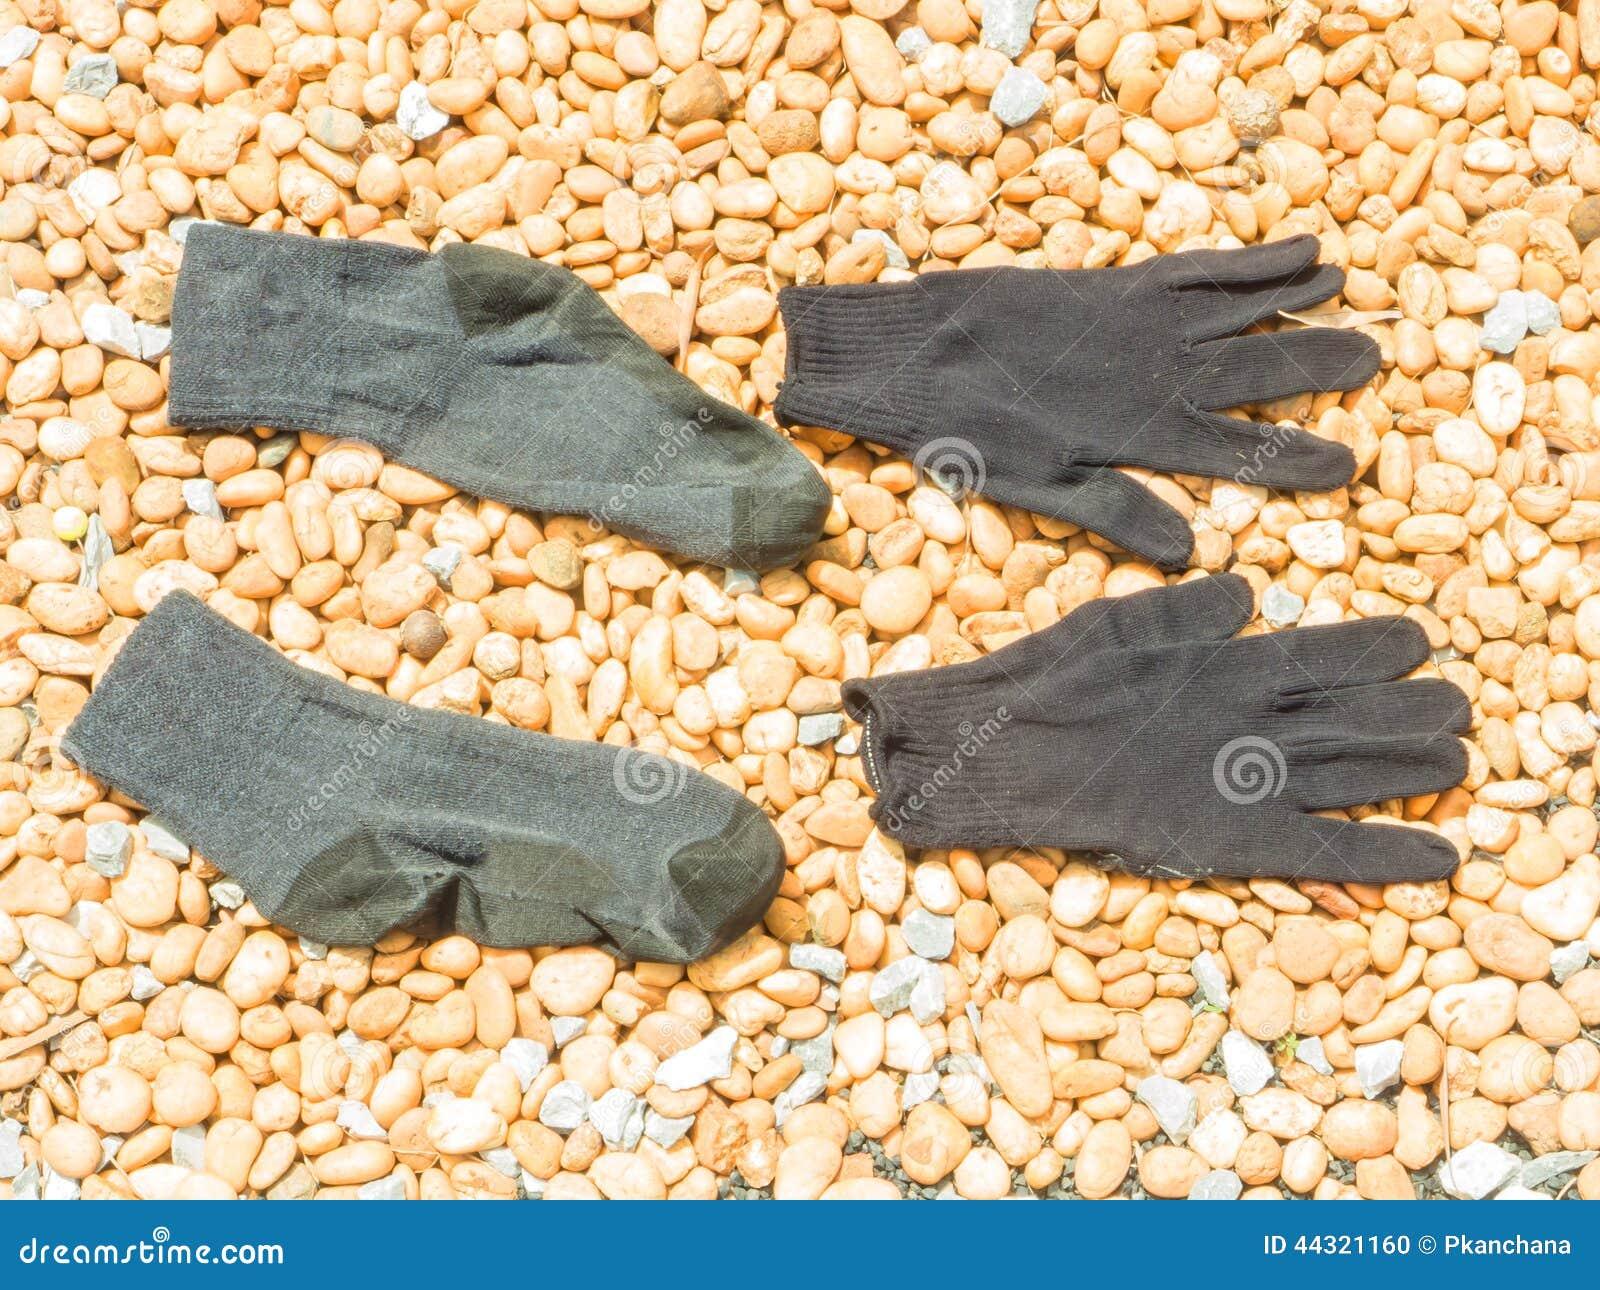 Skarpeta i rękawiczka